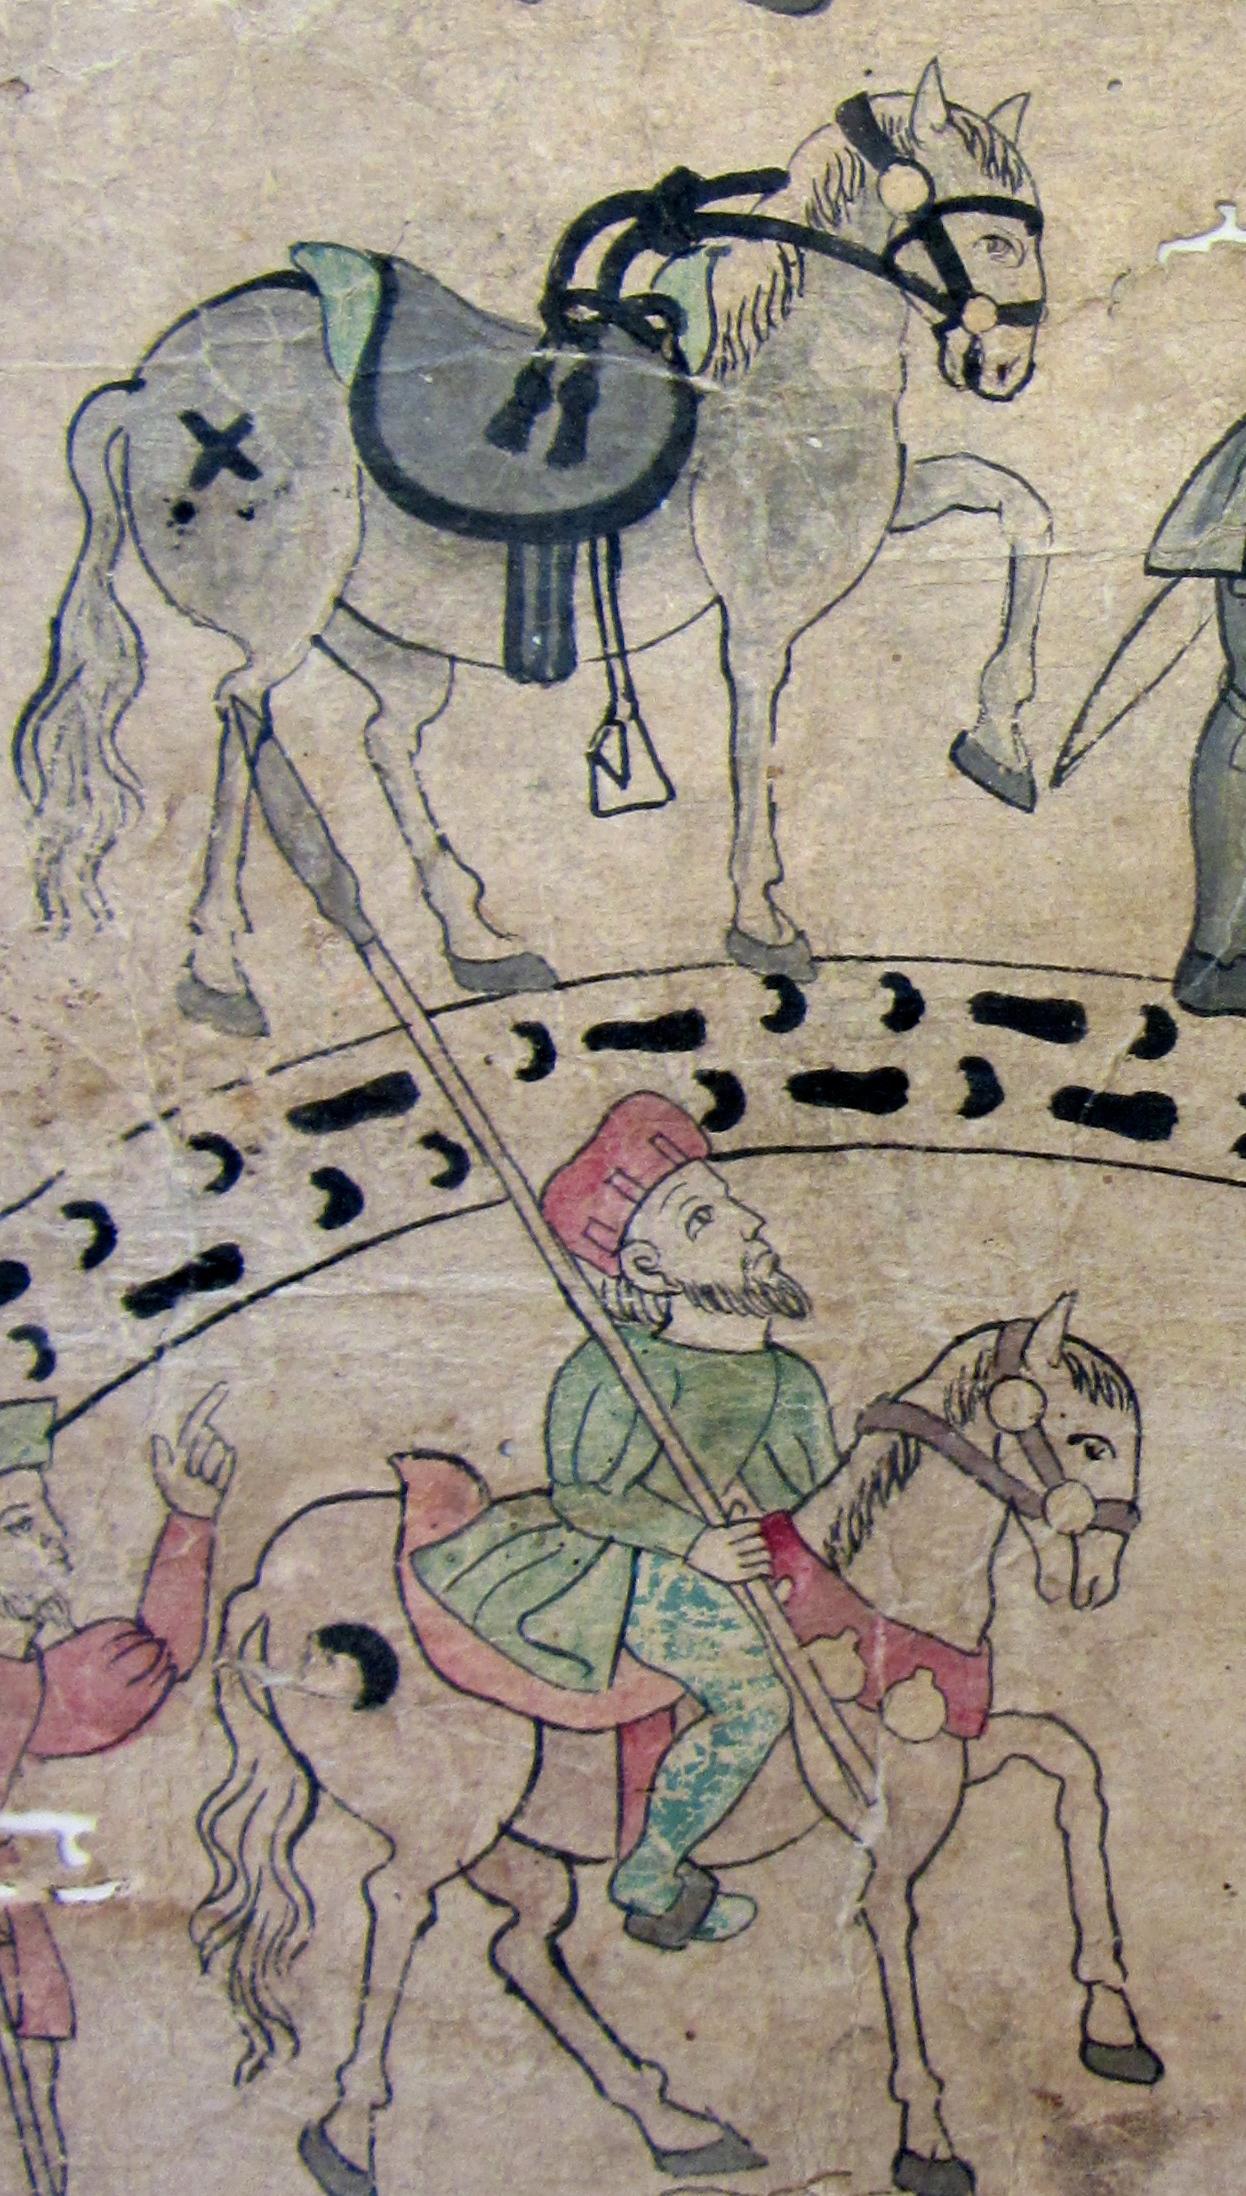 Horses and hoof prints. Lienzo de Tlaxcala, fragment at Benson Library, UT Austin. (S. Wood photo, 5/30/2014)